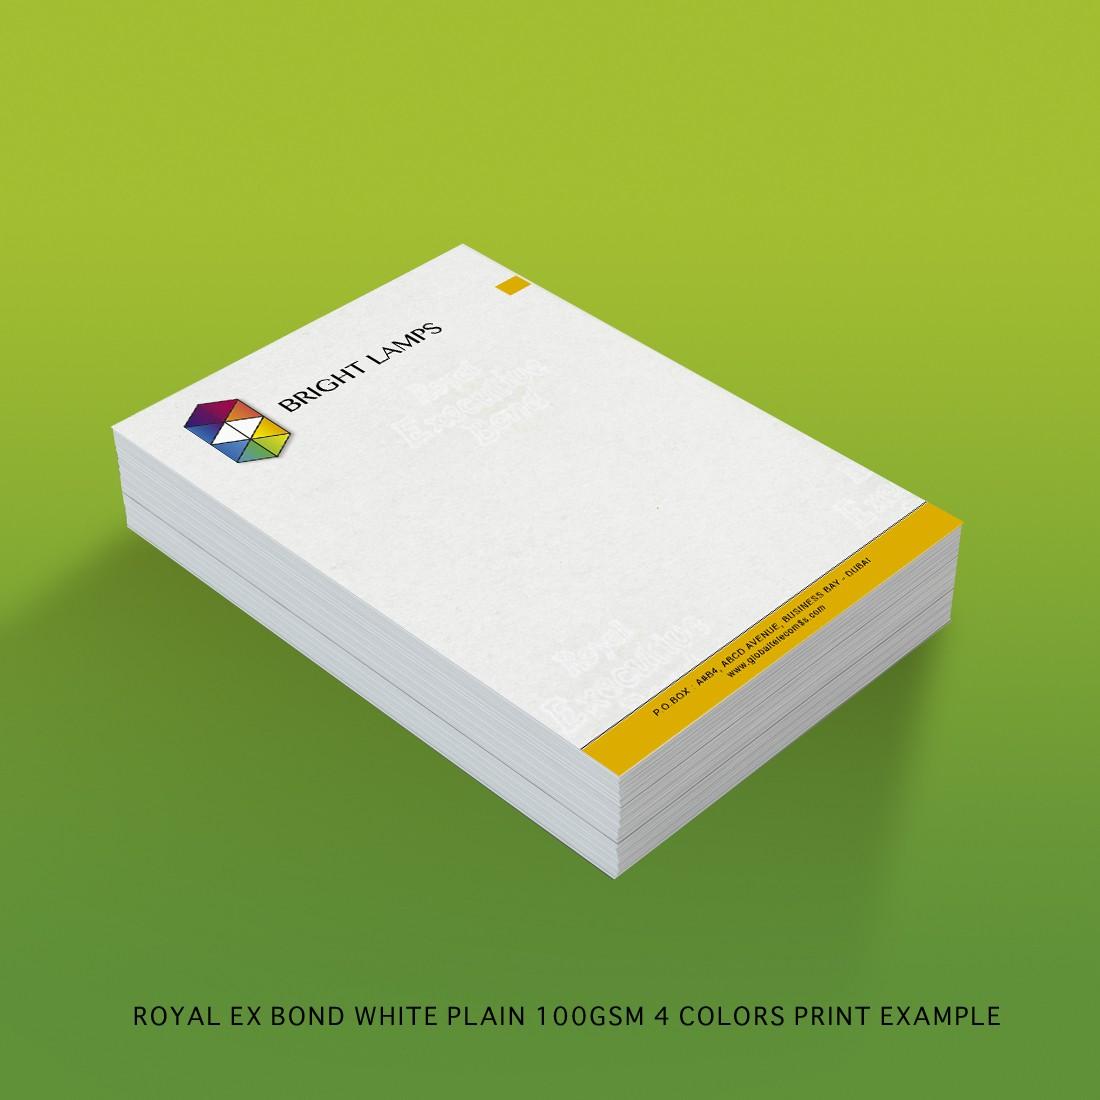 Royal Executive Bond 100gsm white plain 3d view